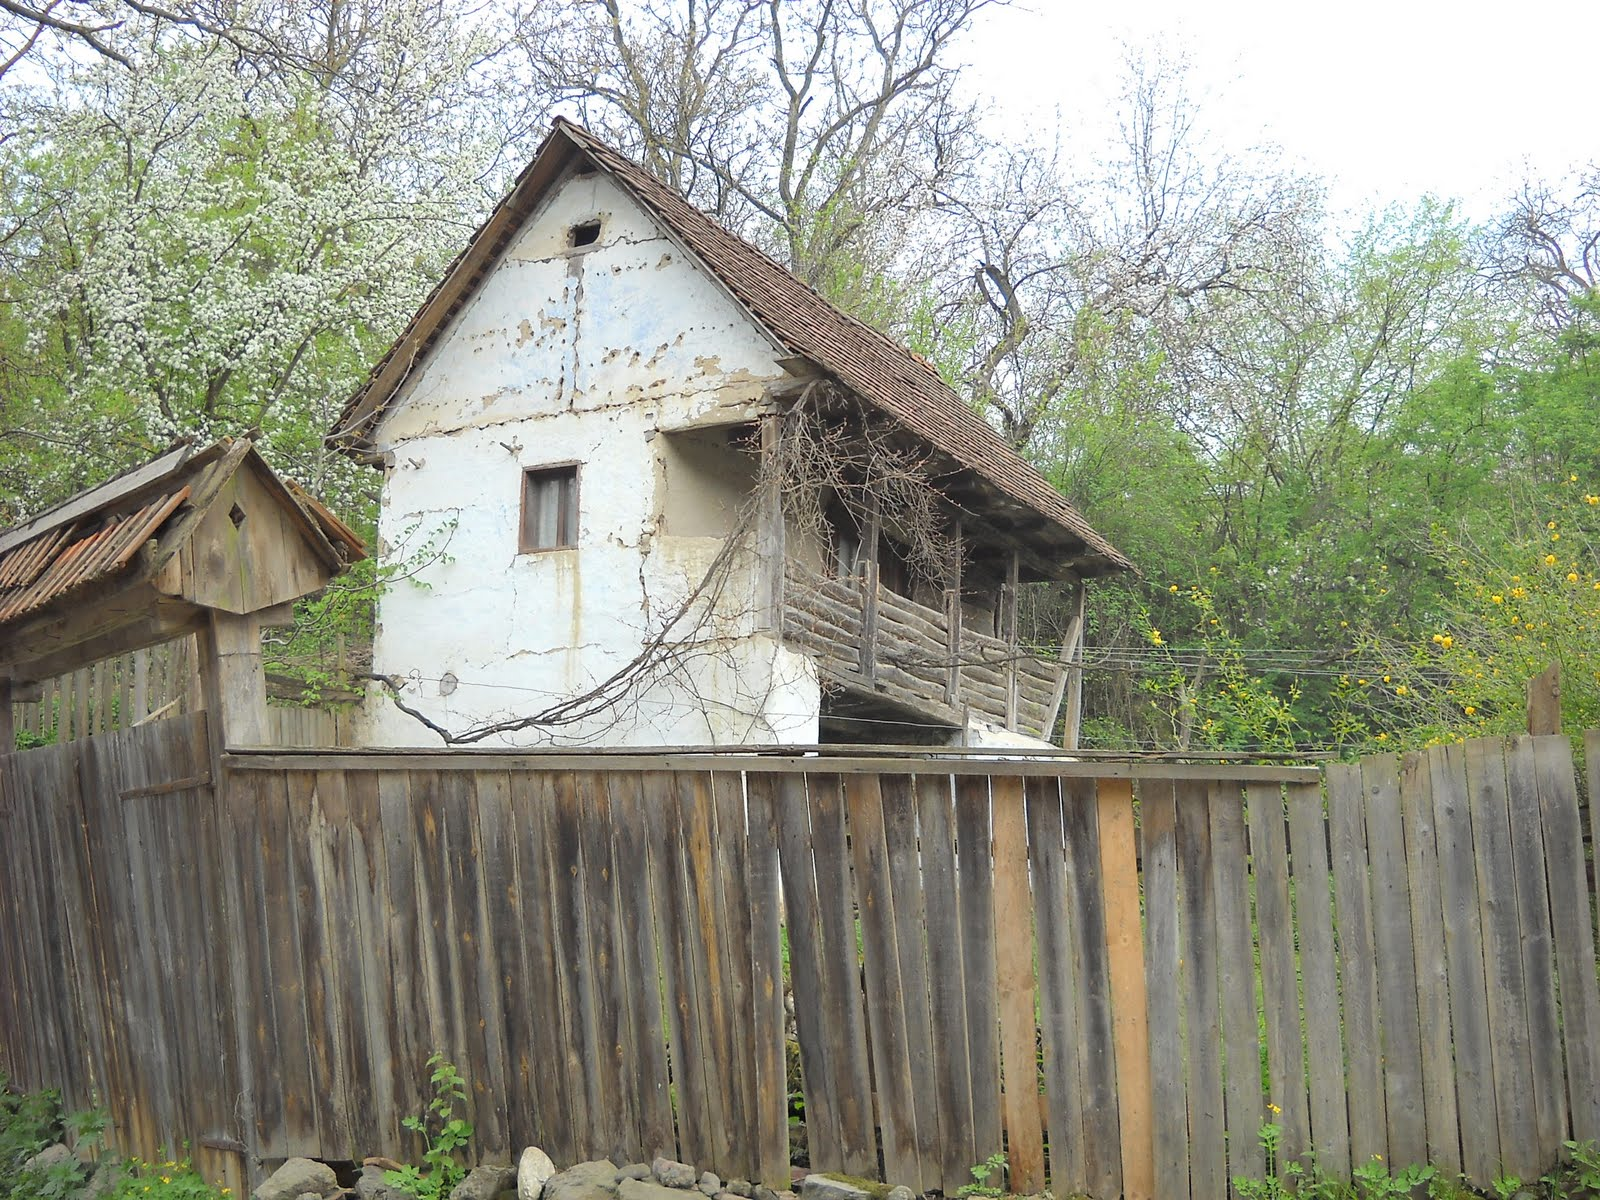 http://4.bp.blogspot.com/_ILnlQVHu15Q/S9bb_Zdei9I/AAAAAAAABNo/MTSd6-IpeHc/s1600/casa+veche+in+Paiuseni.jpg